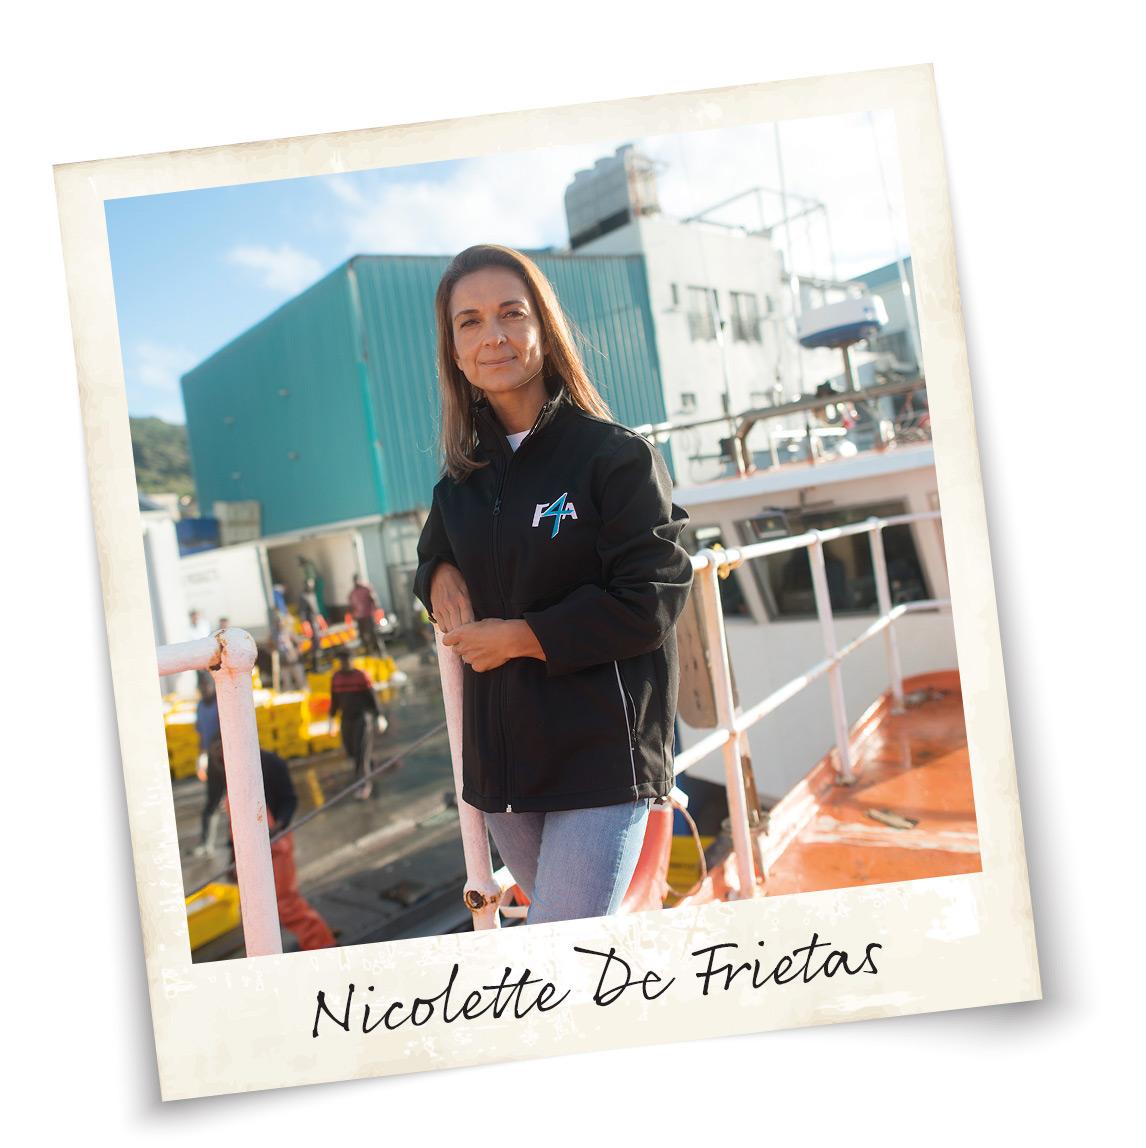 Nicolette De Frietas